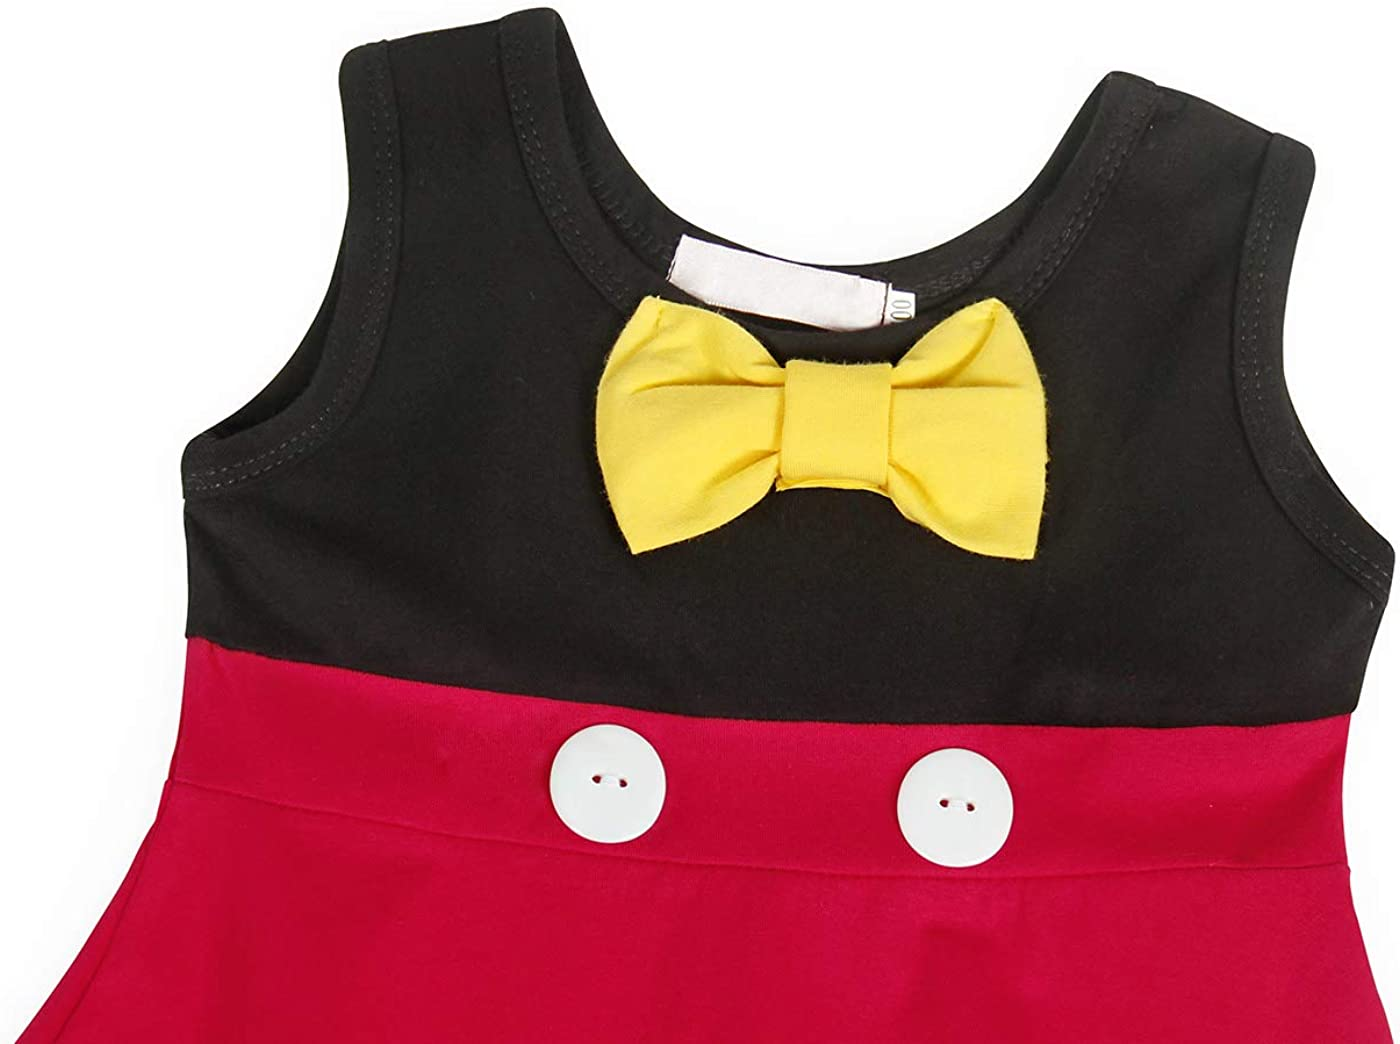 AmzBarley Girls Dress Polka Dots Kids Costume Halloween Fancy Dress Party Christmas